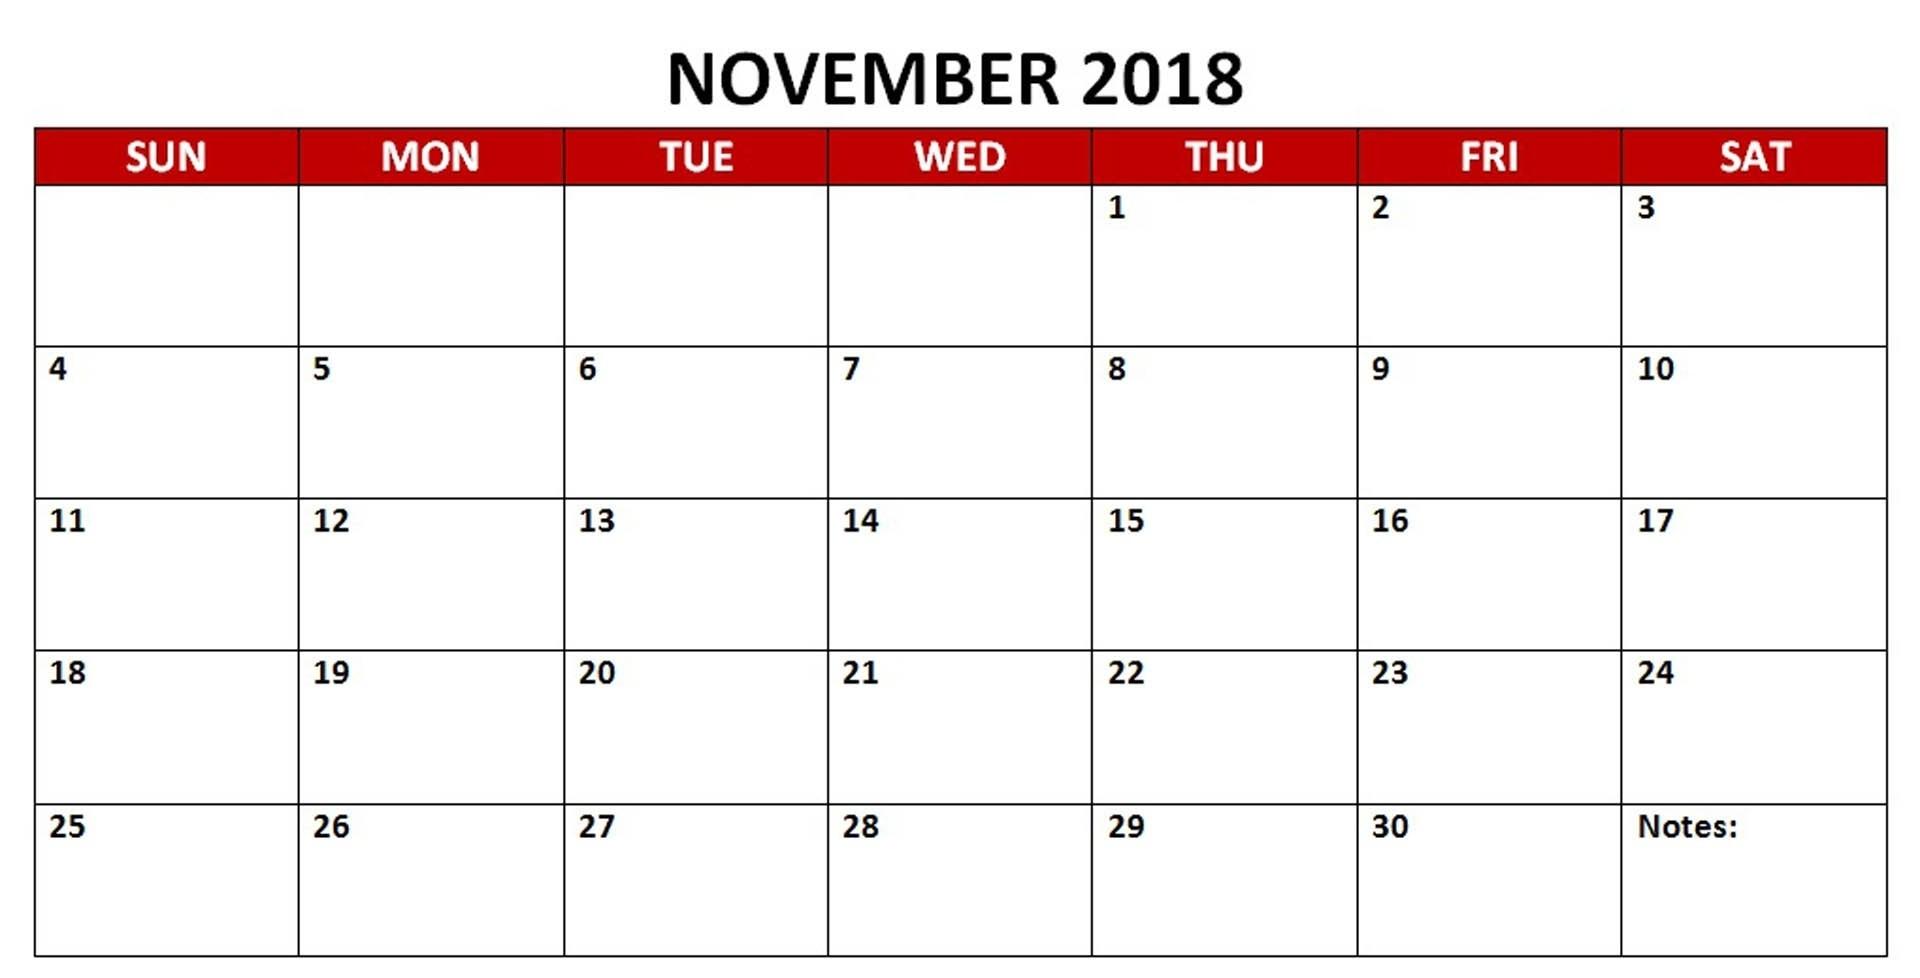 november 2018 calendar pink november 2018 calendar pink letter::November 2018 Calendar Template